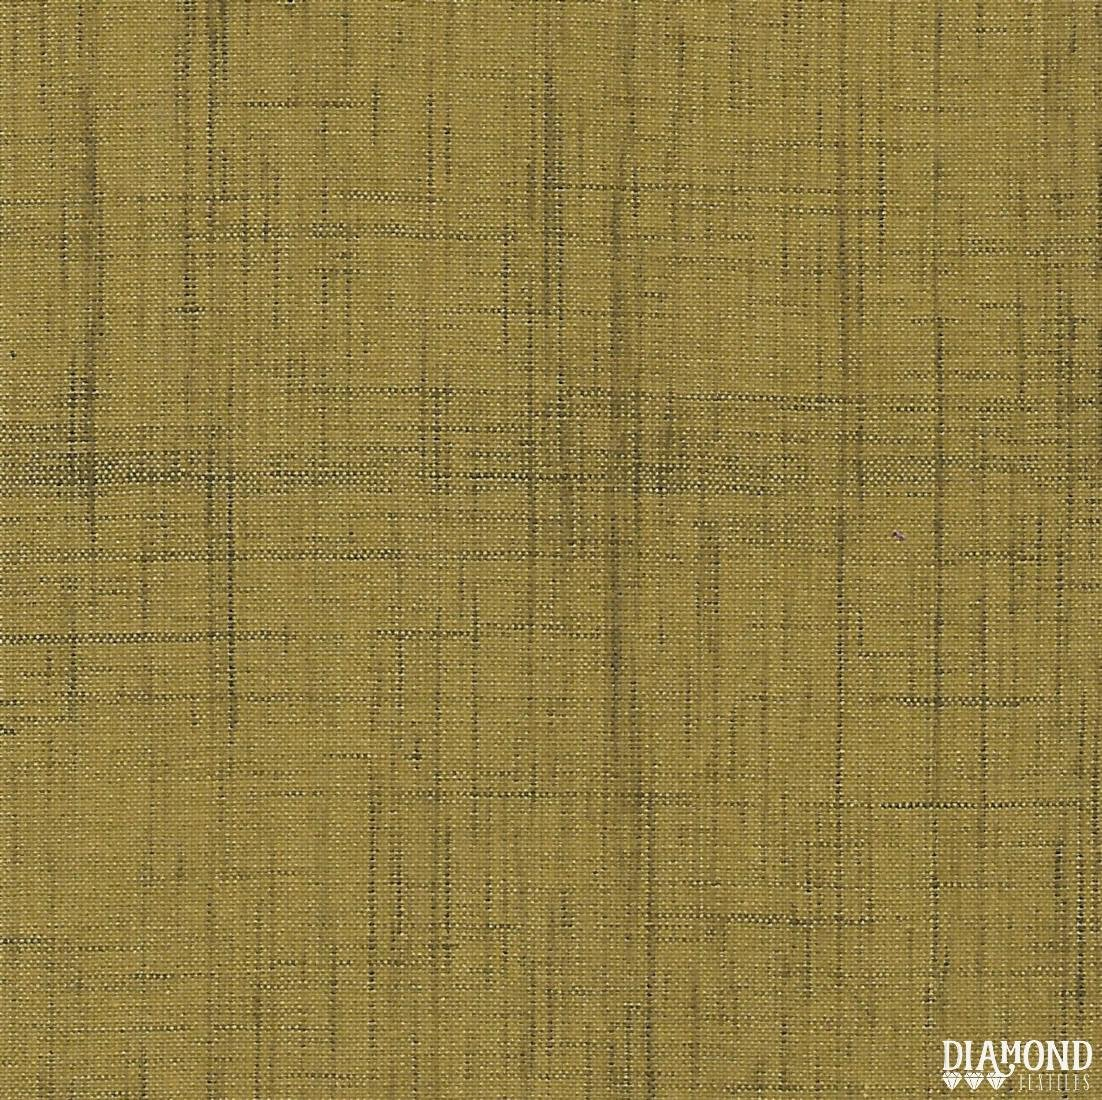 tt-4805_Tweed Thicket_Lemon Grass